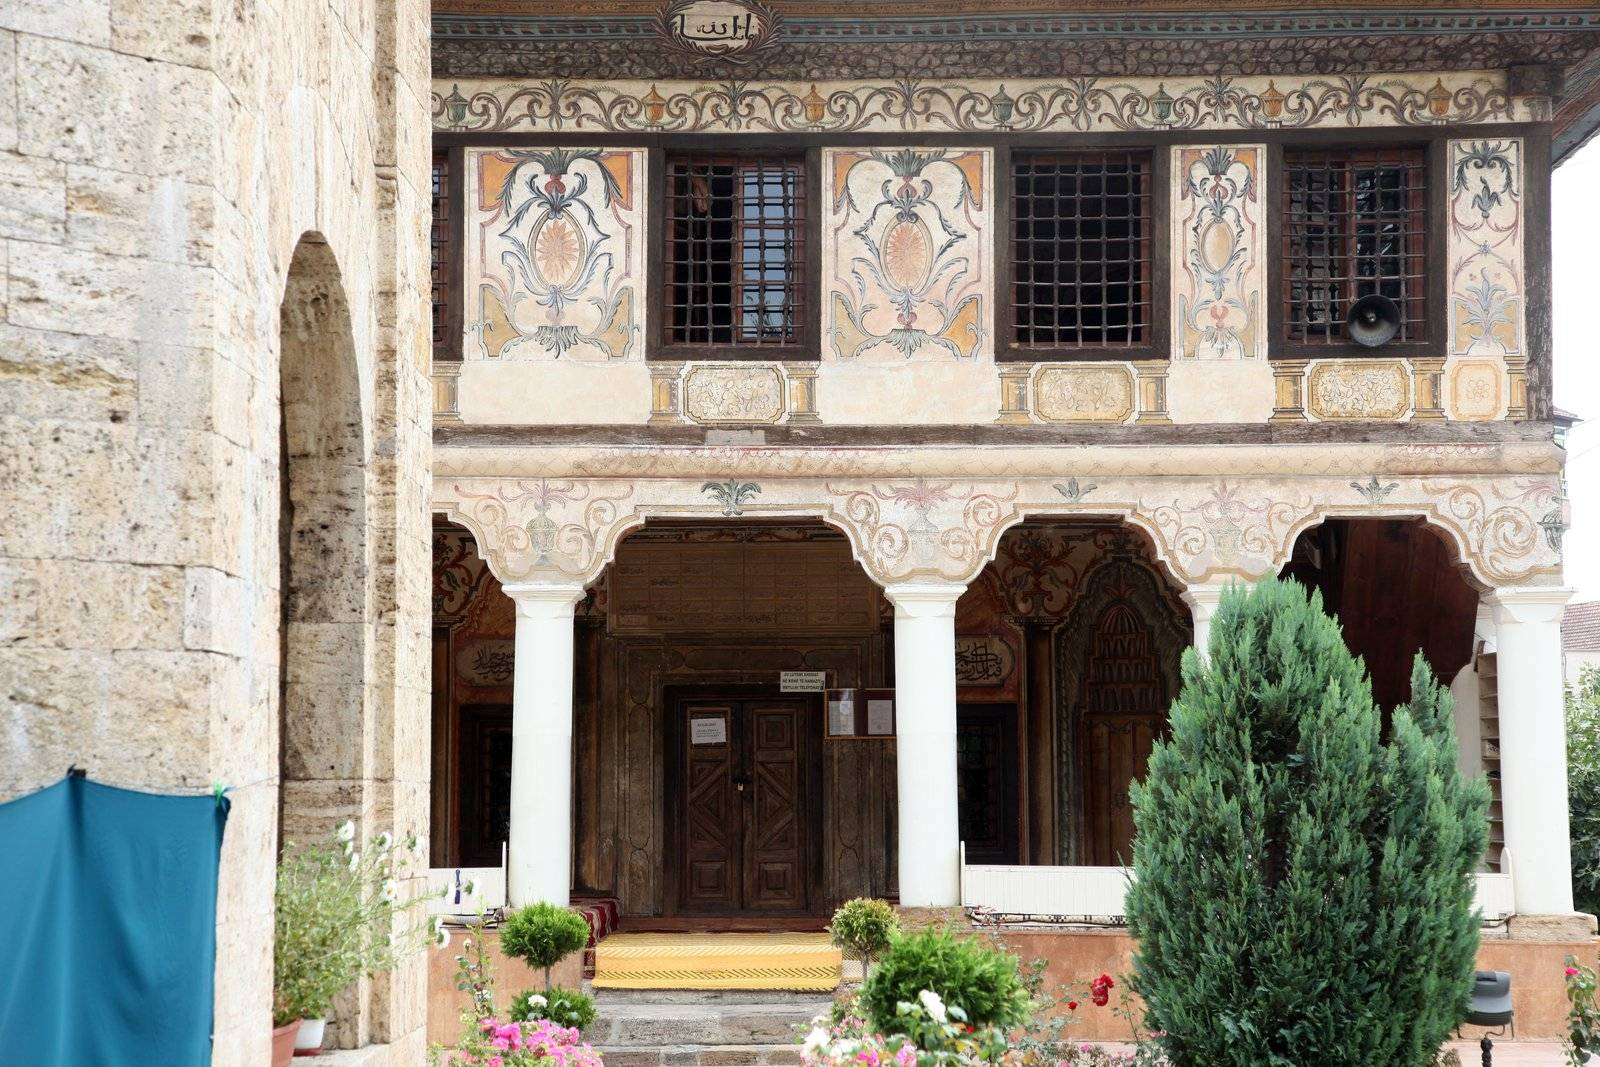 aladza, allah, arabic, balkans, baroque, city - D13124744